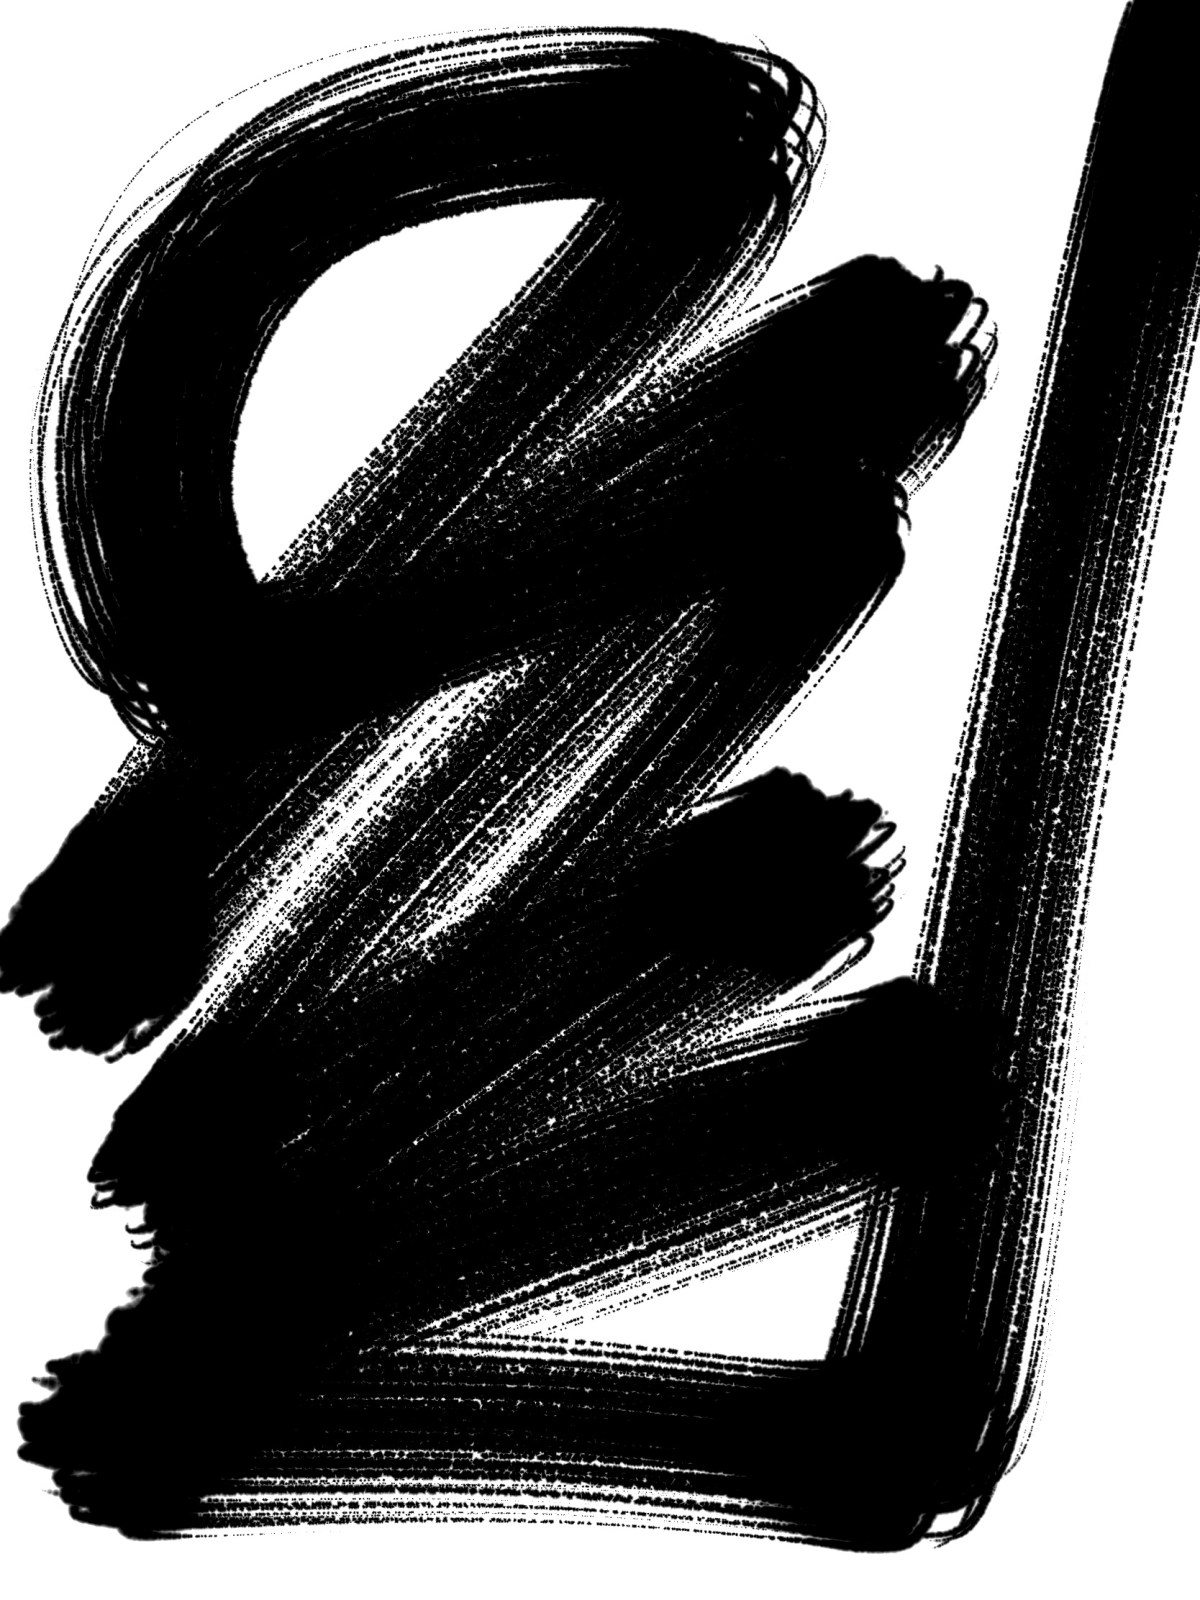 Convenience ERIC KIM abstract zen calligraphy